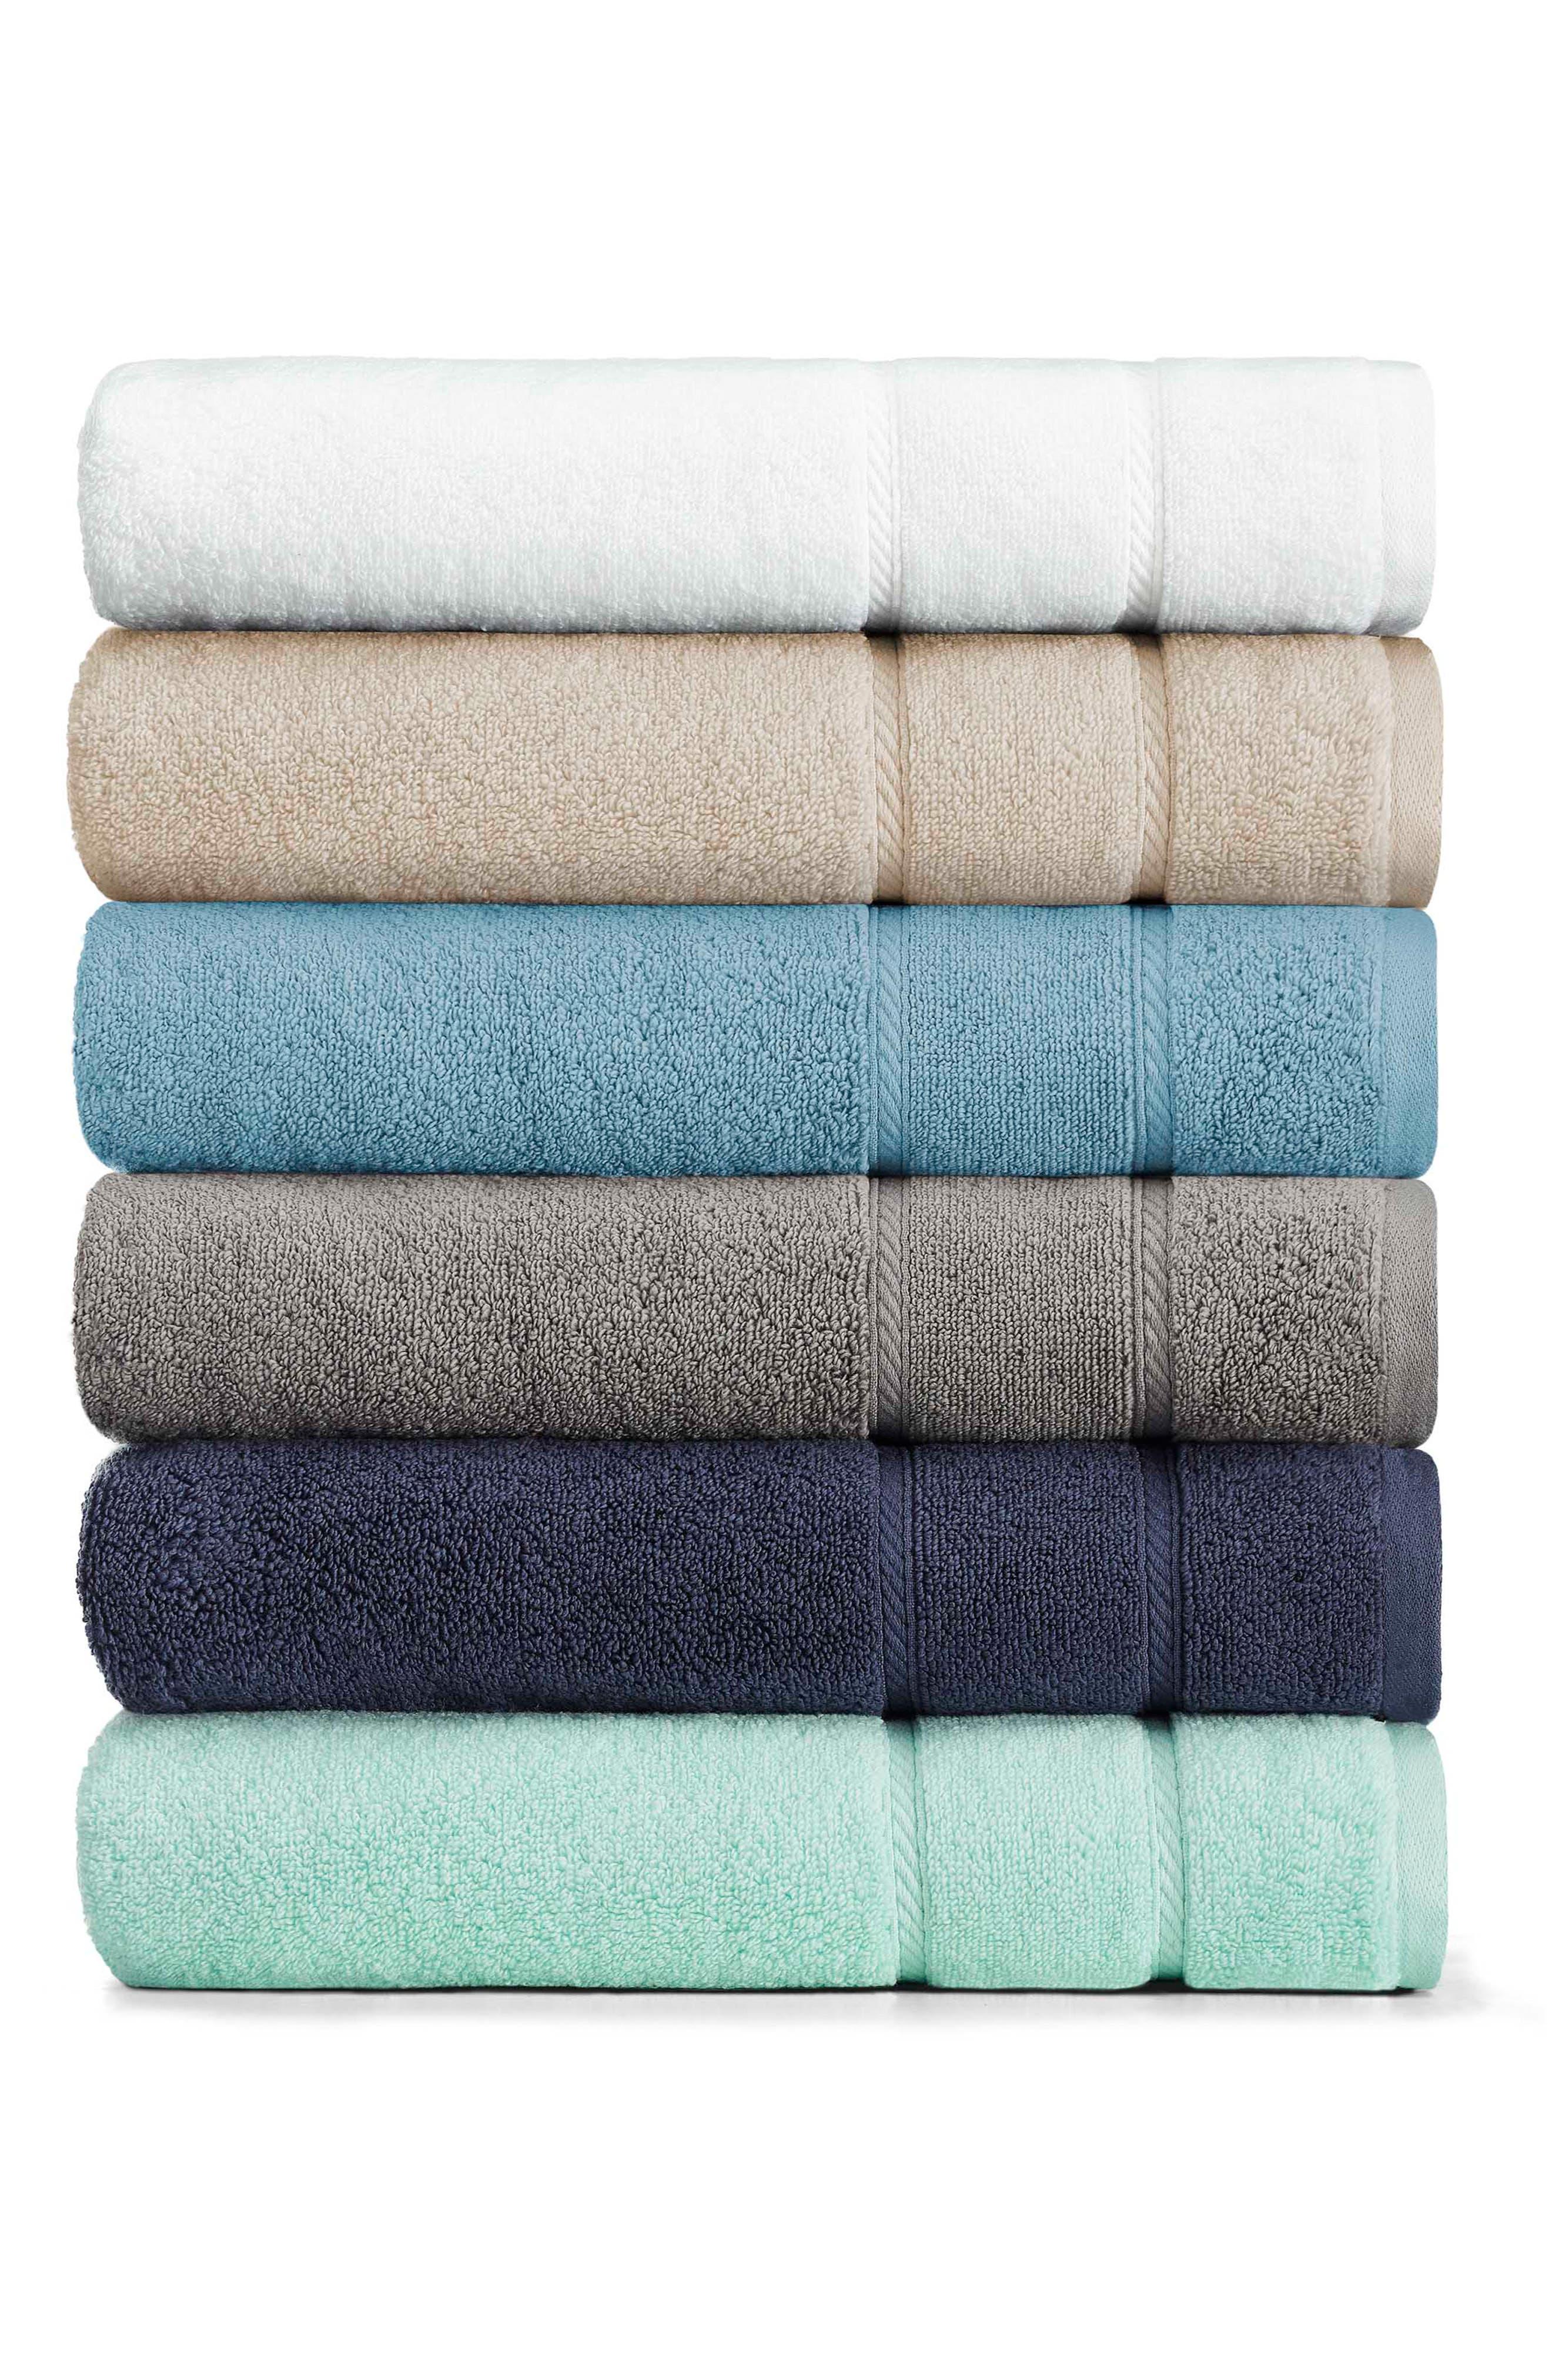 NAUTICA, Belle Haven Set of 2 Bath Towels, Alternate thumbnail 2, color, DARK GREY